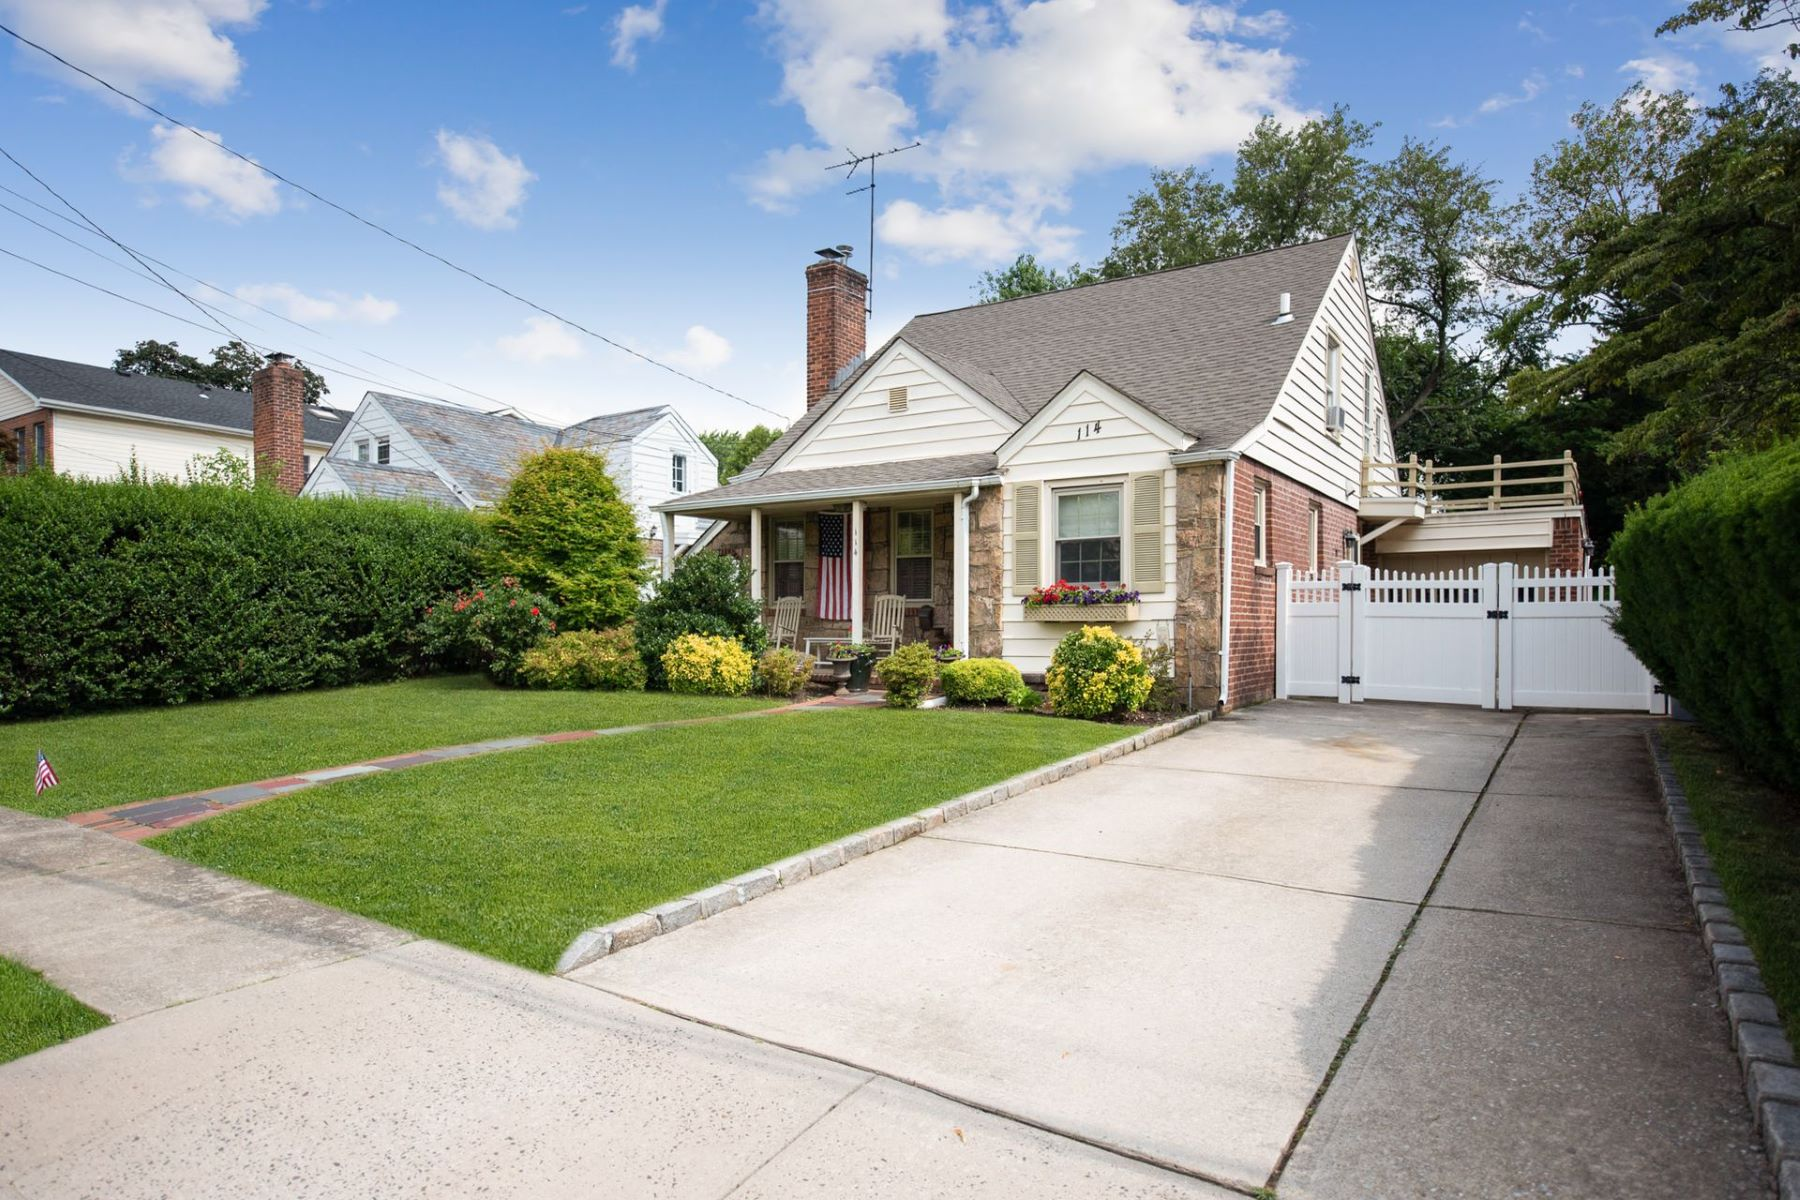 Single Family Homes for Sale at Malverne 114 Morris Ave Malverne, New York 11565 United States